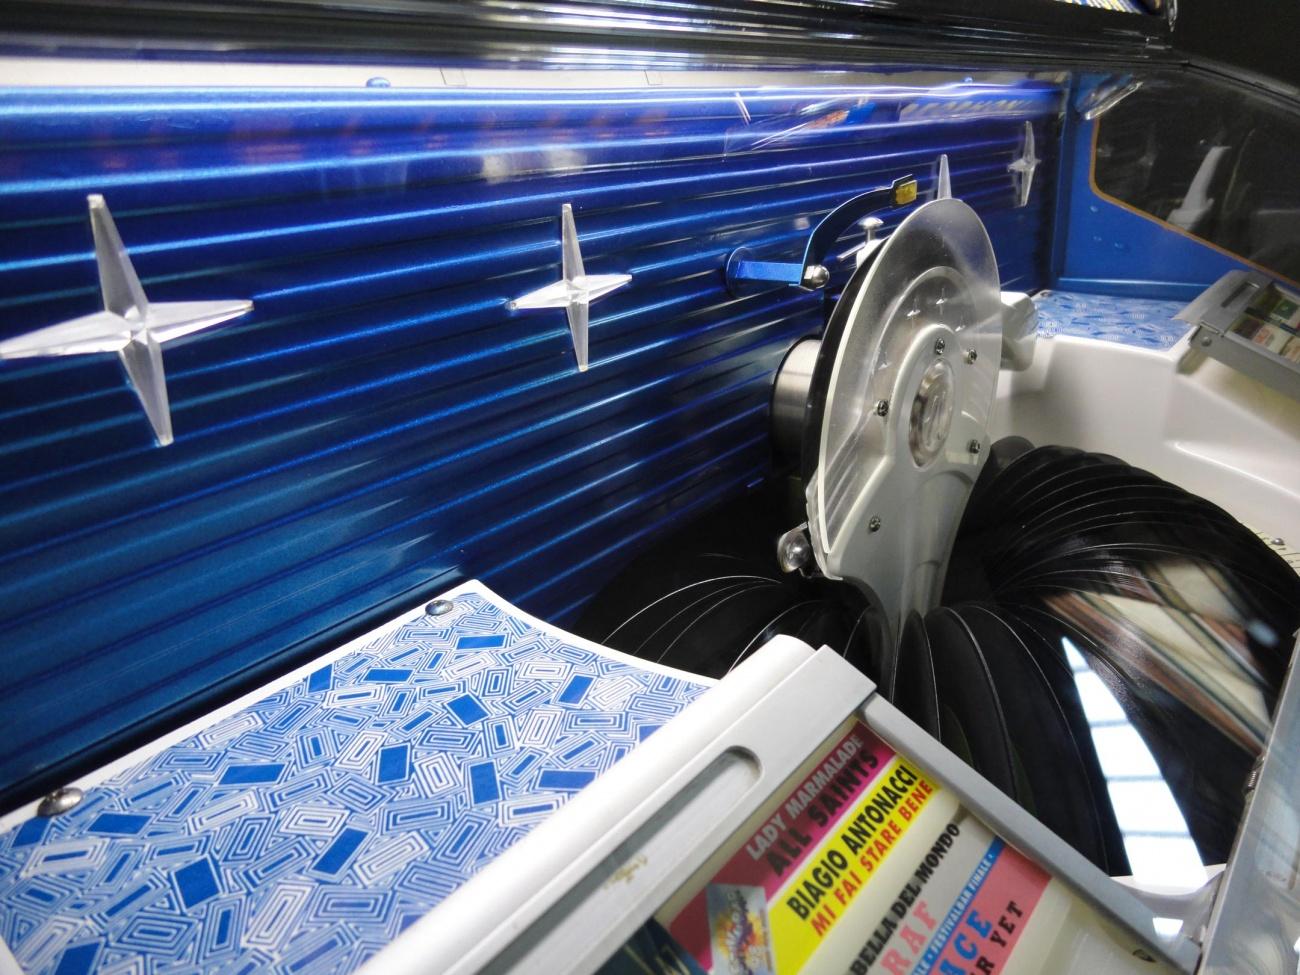 jukebox wurlitzer 2300